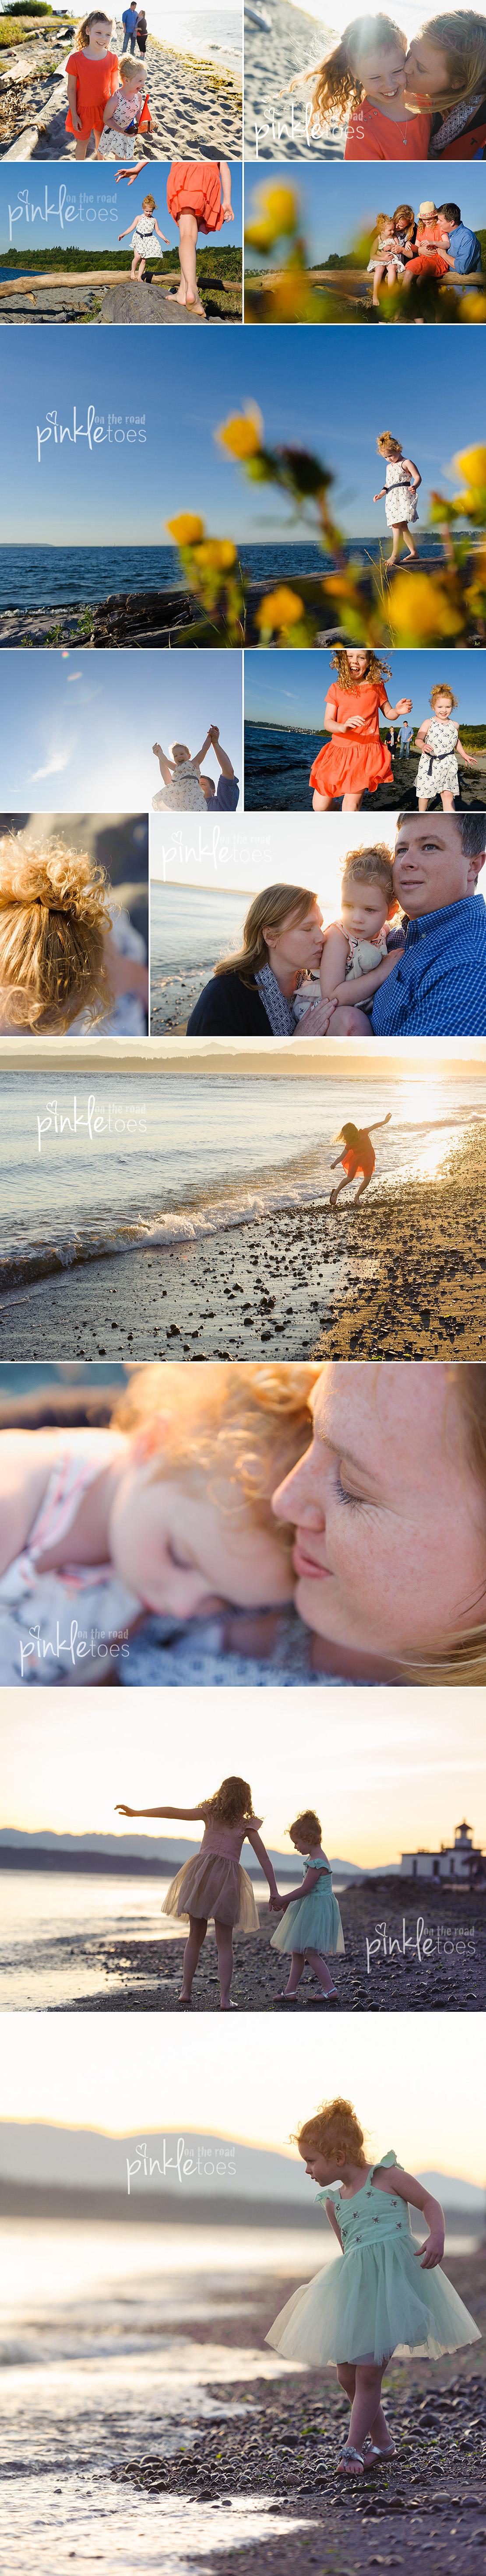 jt-austin-family-photographer-beach-kids-photo-shoot-seattle-washington-discovery-park-lighthouse